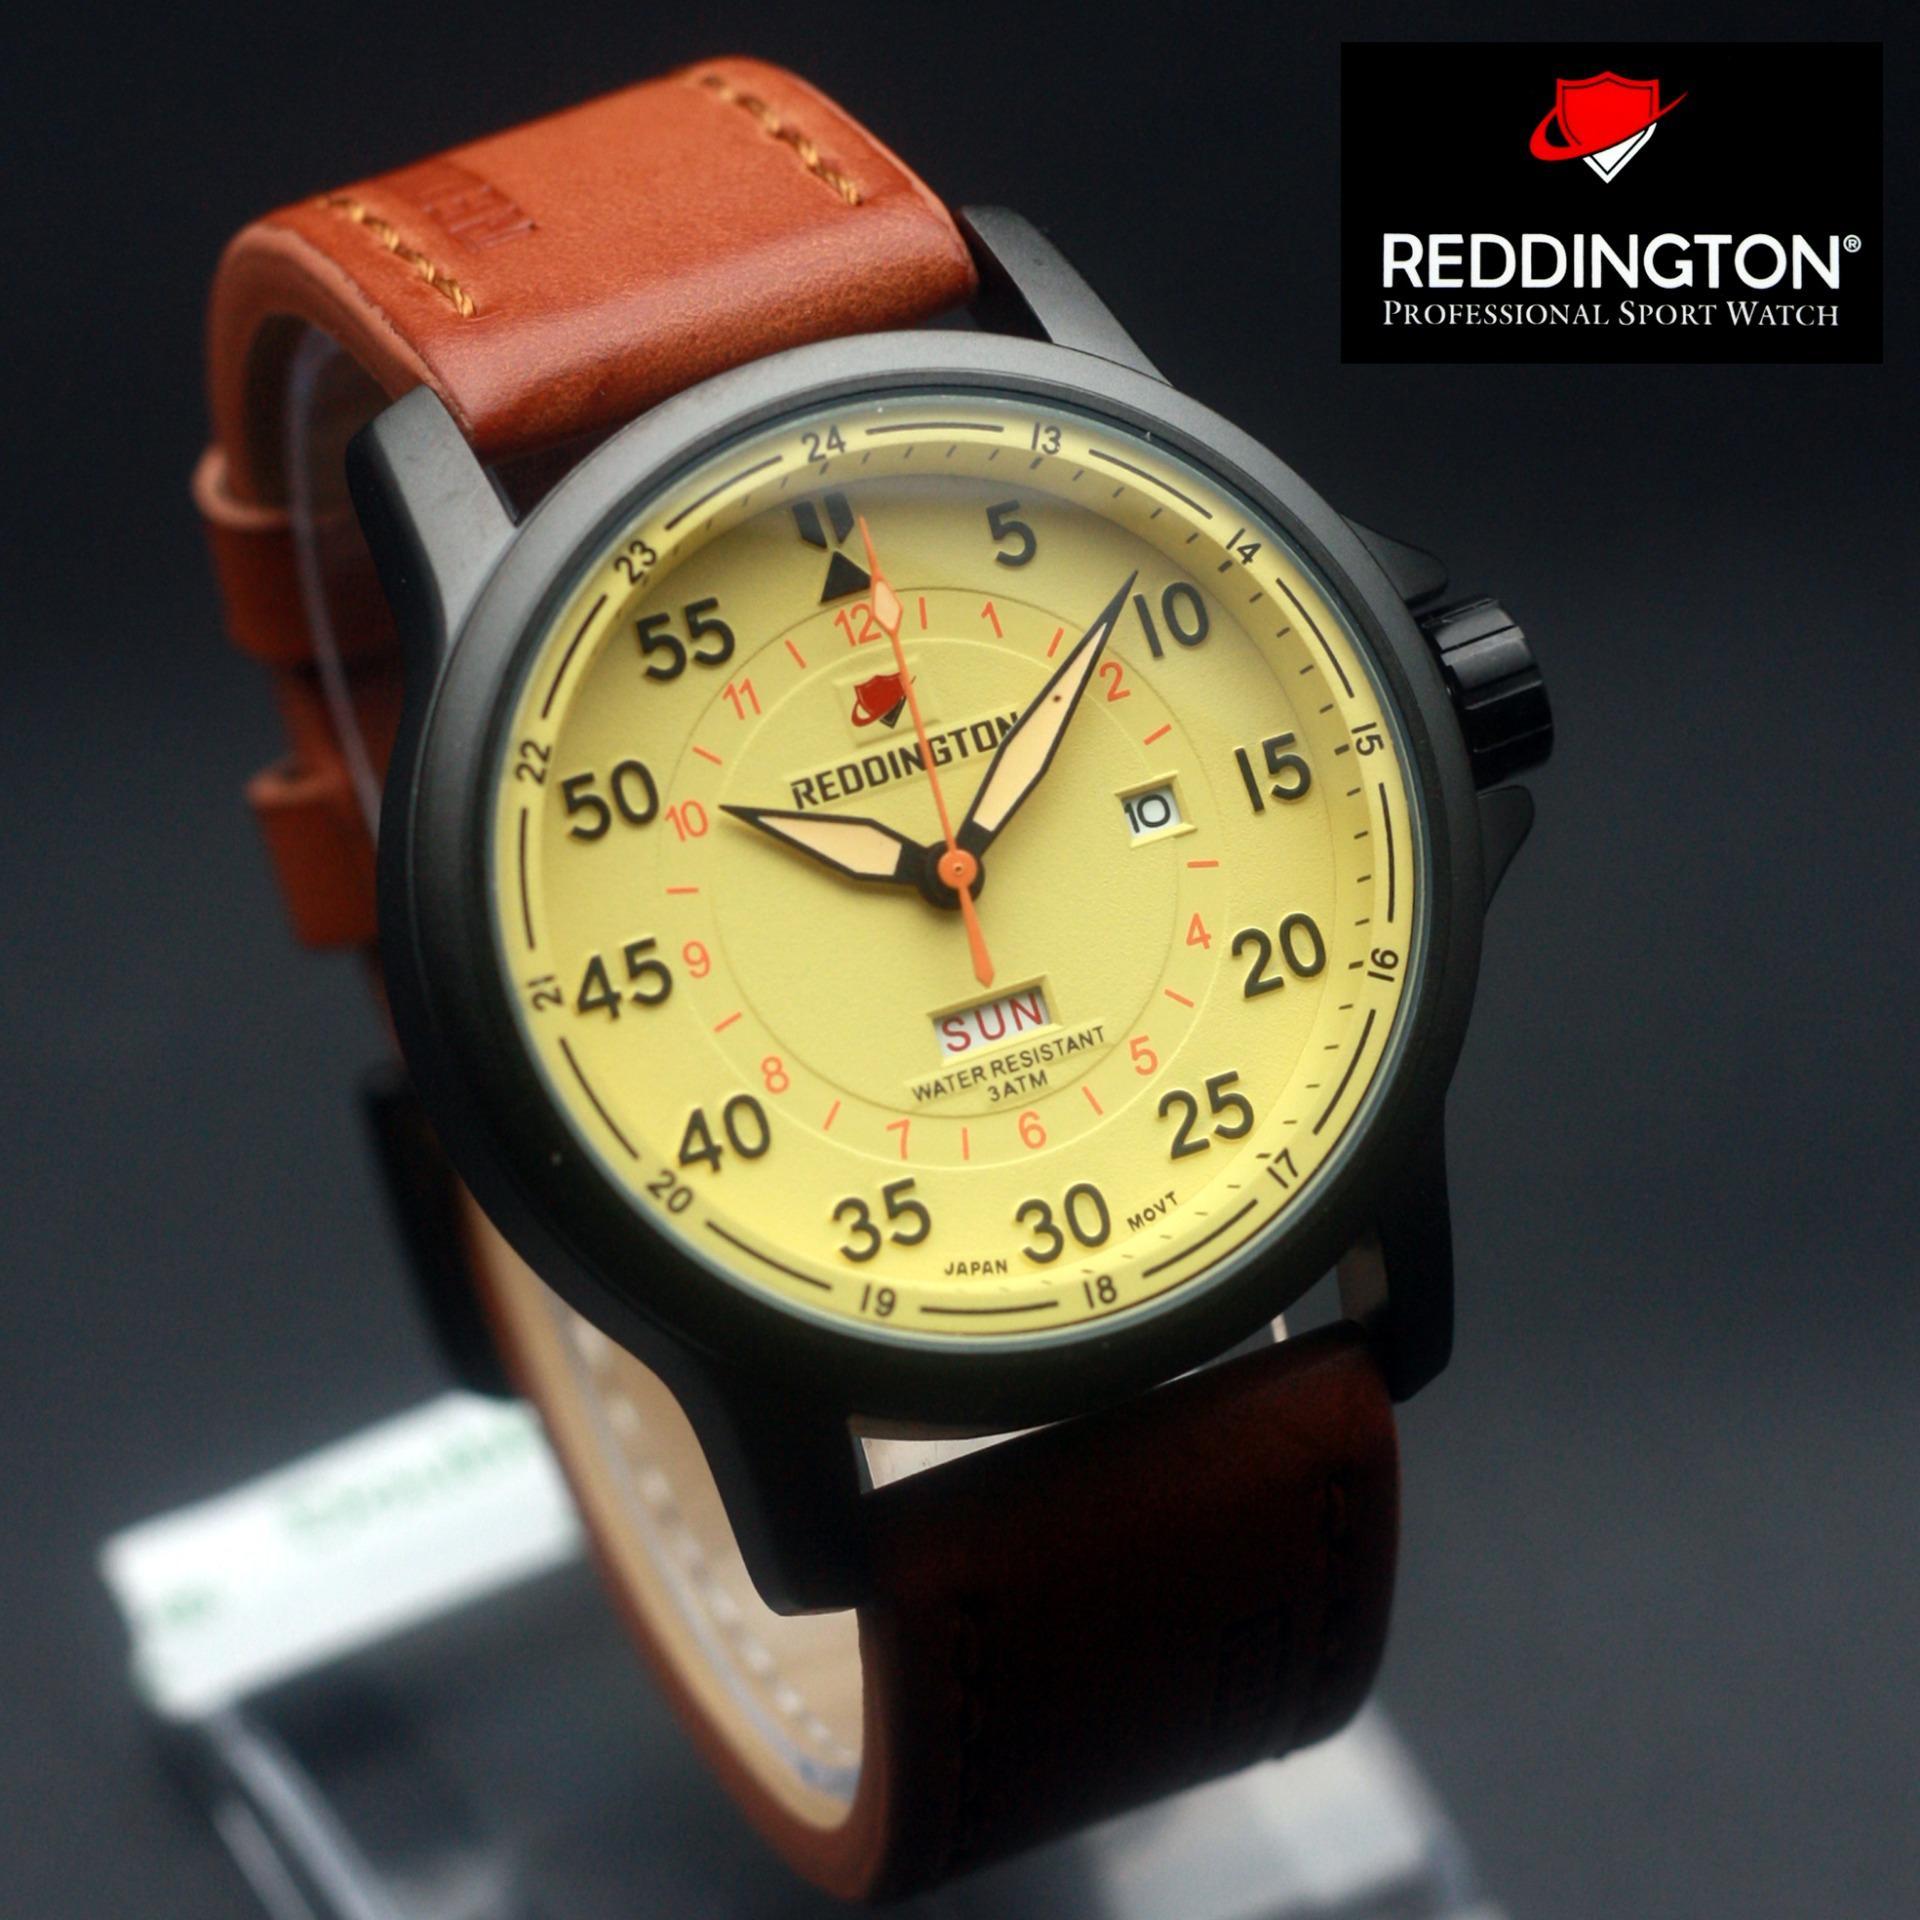 Reddington Original Watch Jam Tangan Pria Leather Strap Genuine Swiss Army Digital Hitam Rubber Sa 6228